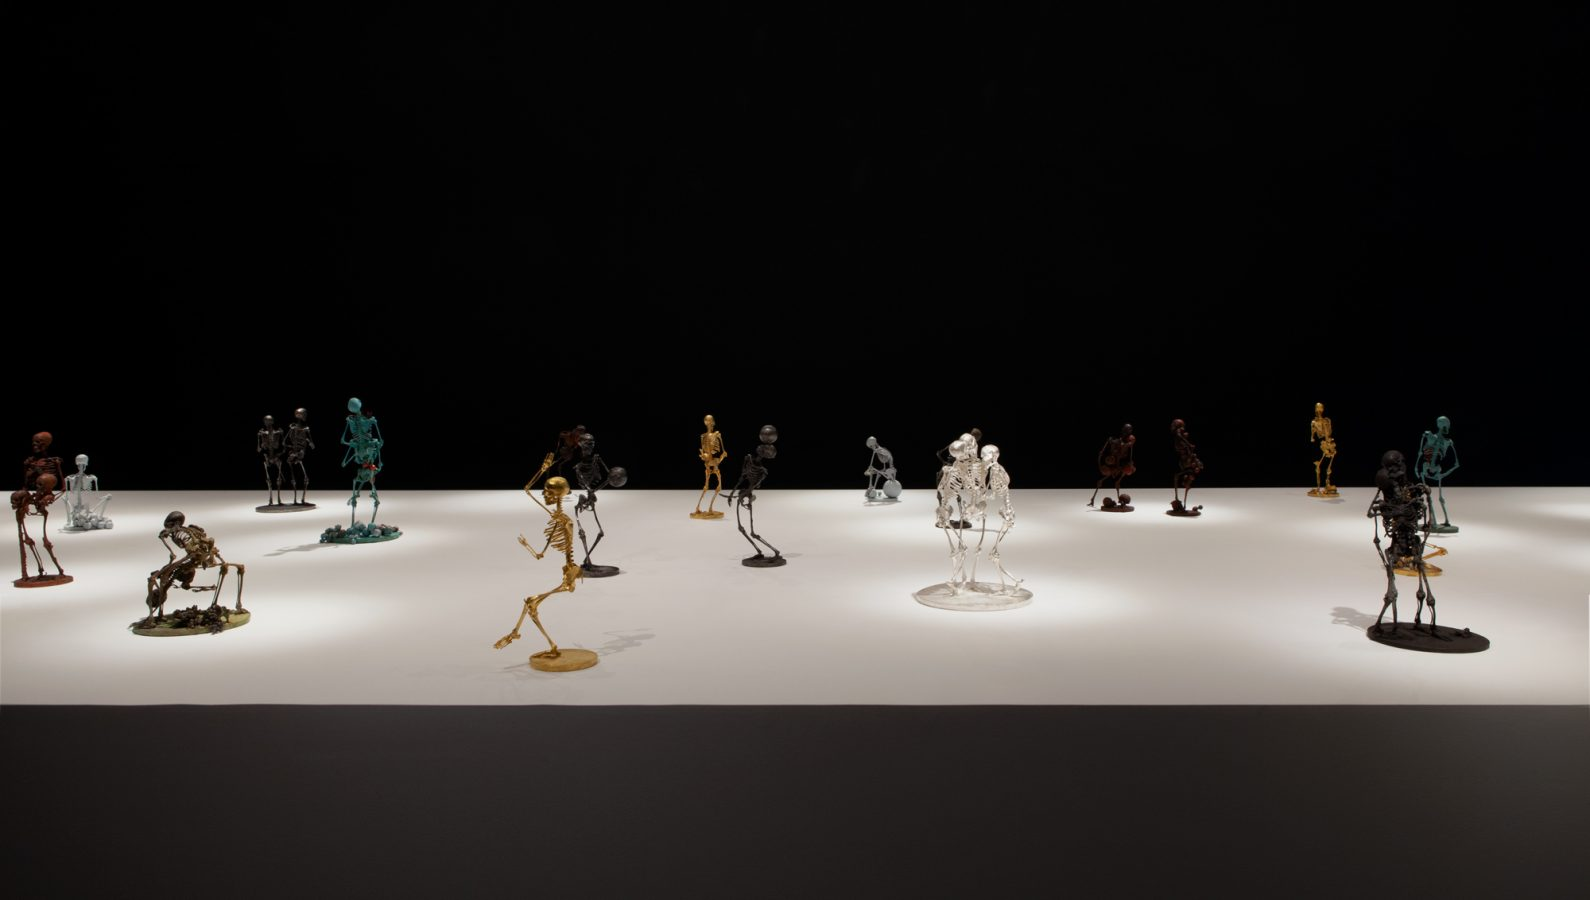 Galeria Pedro Cera – Miguel Branco - Naked Lunch